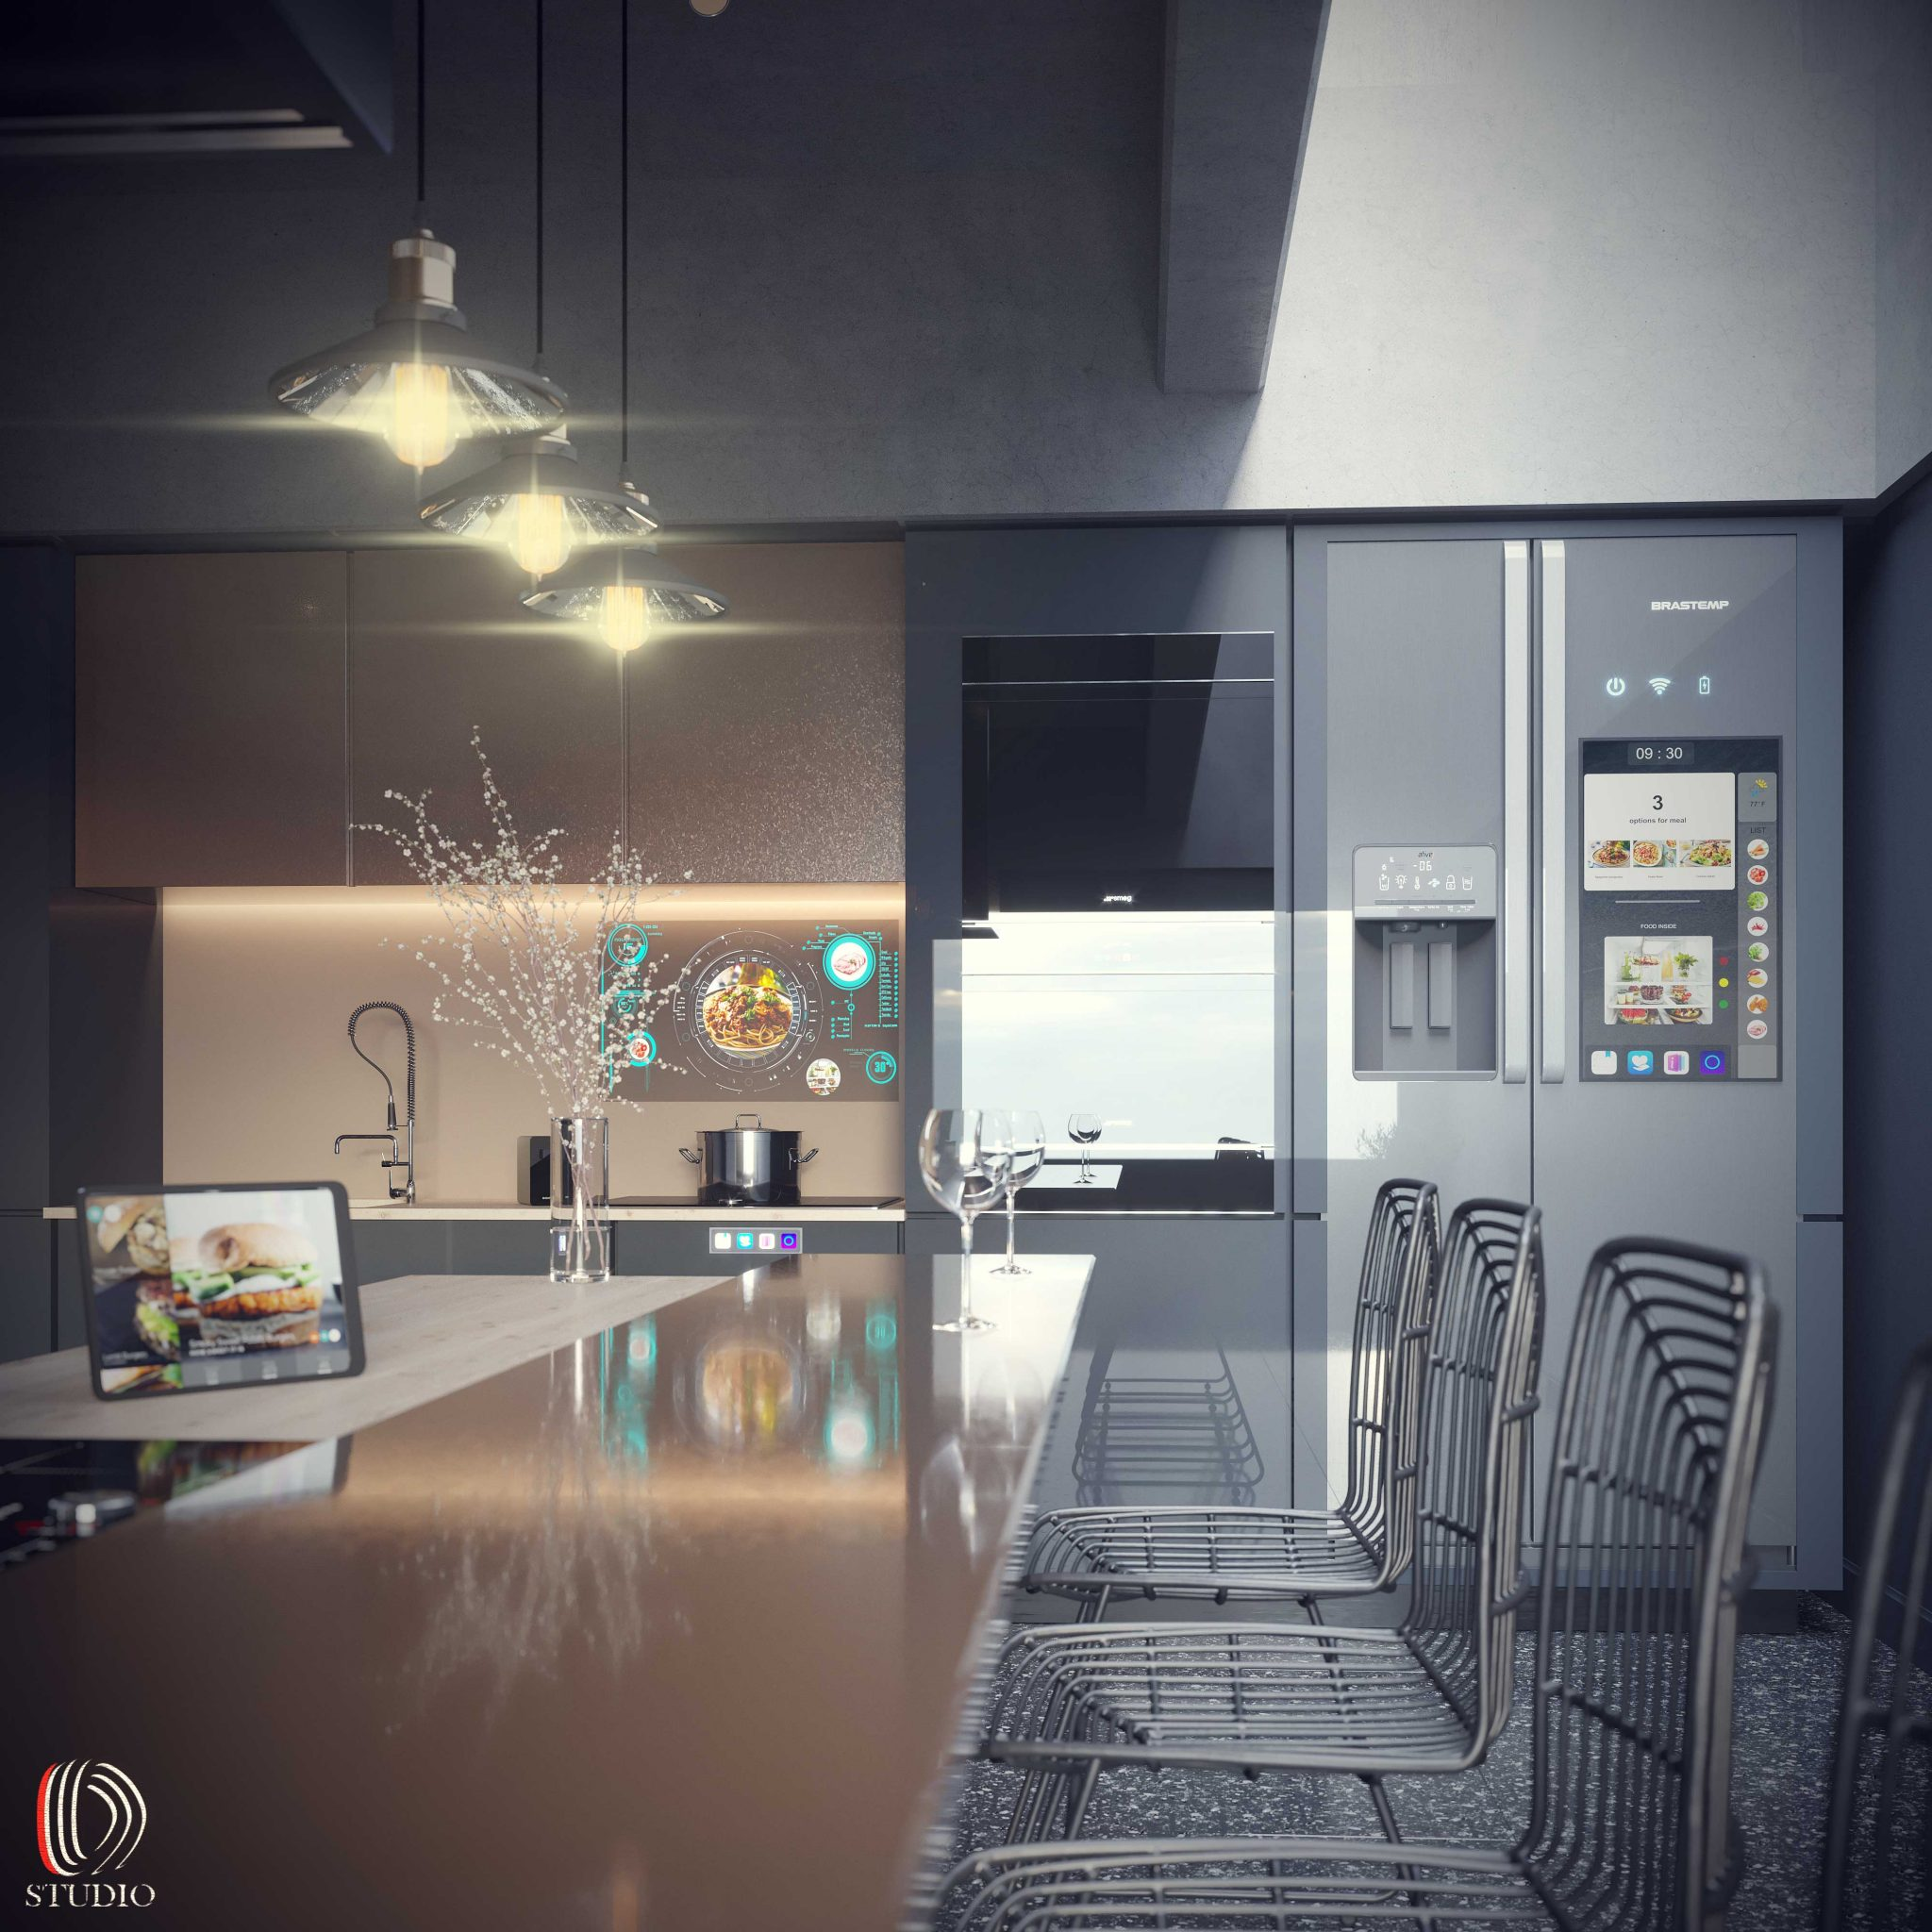 00-20-01-Smart-Kitchen-Technology-View6